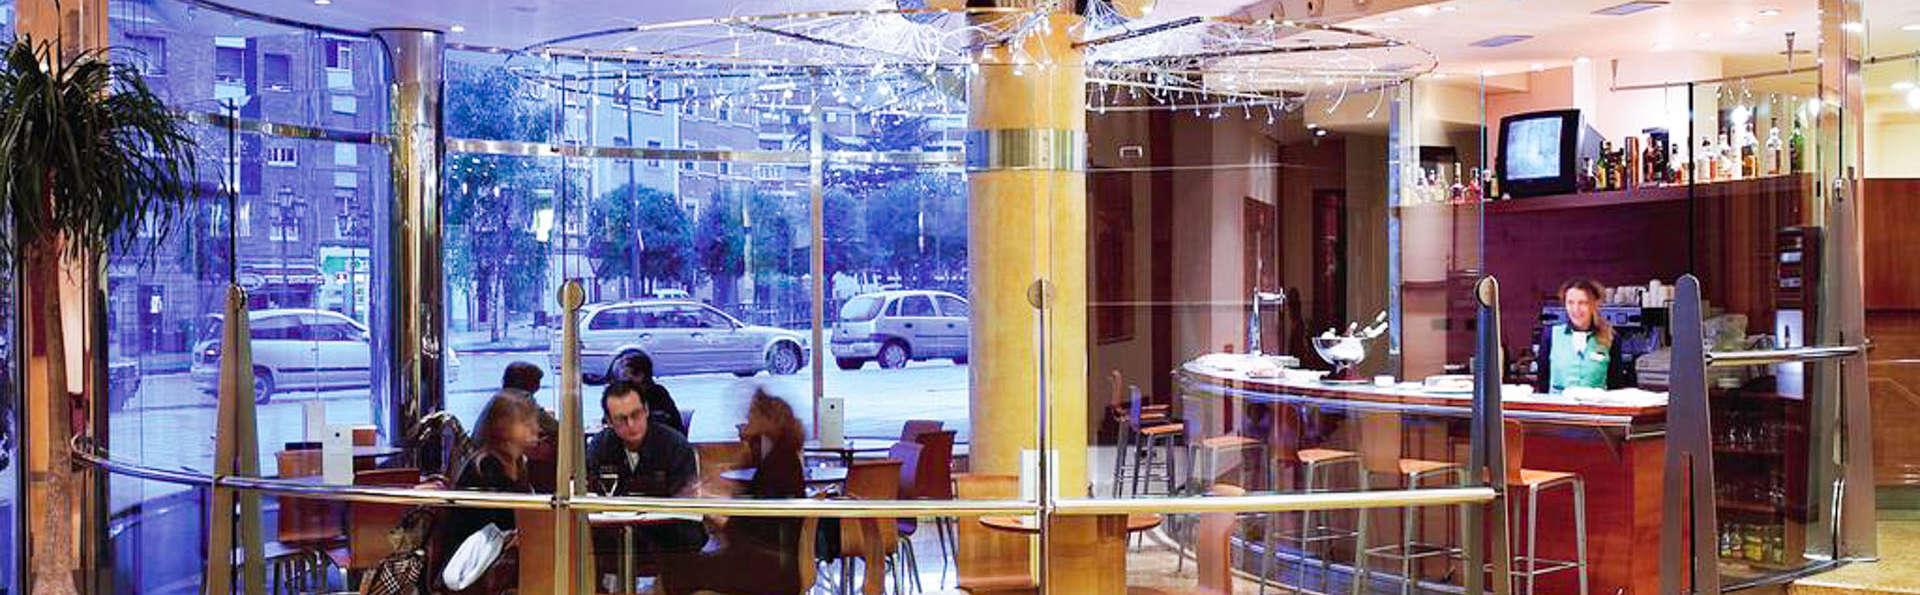 Silken Monumental Naranco - EDIT_LOOBY.jpg